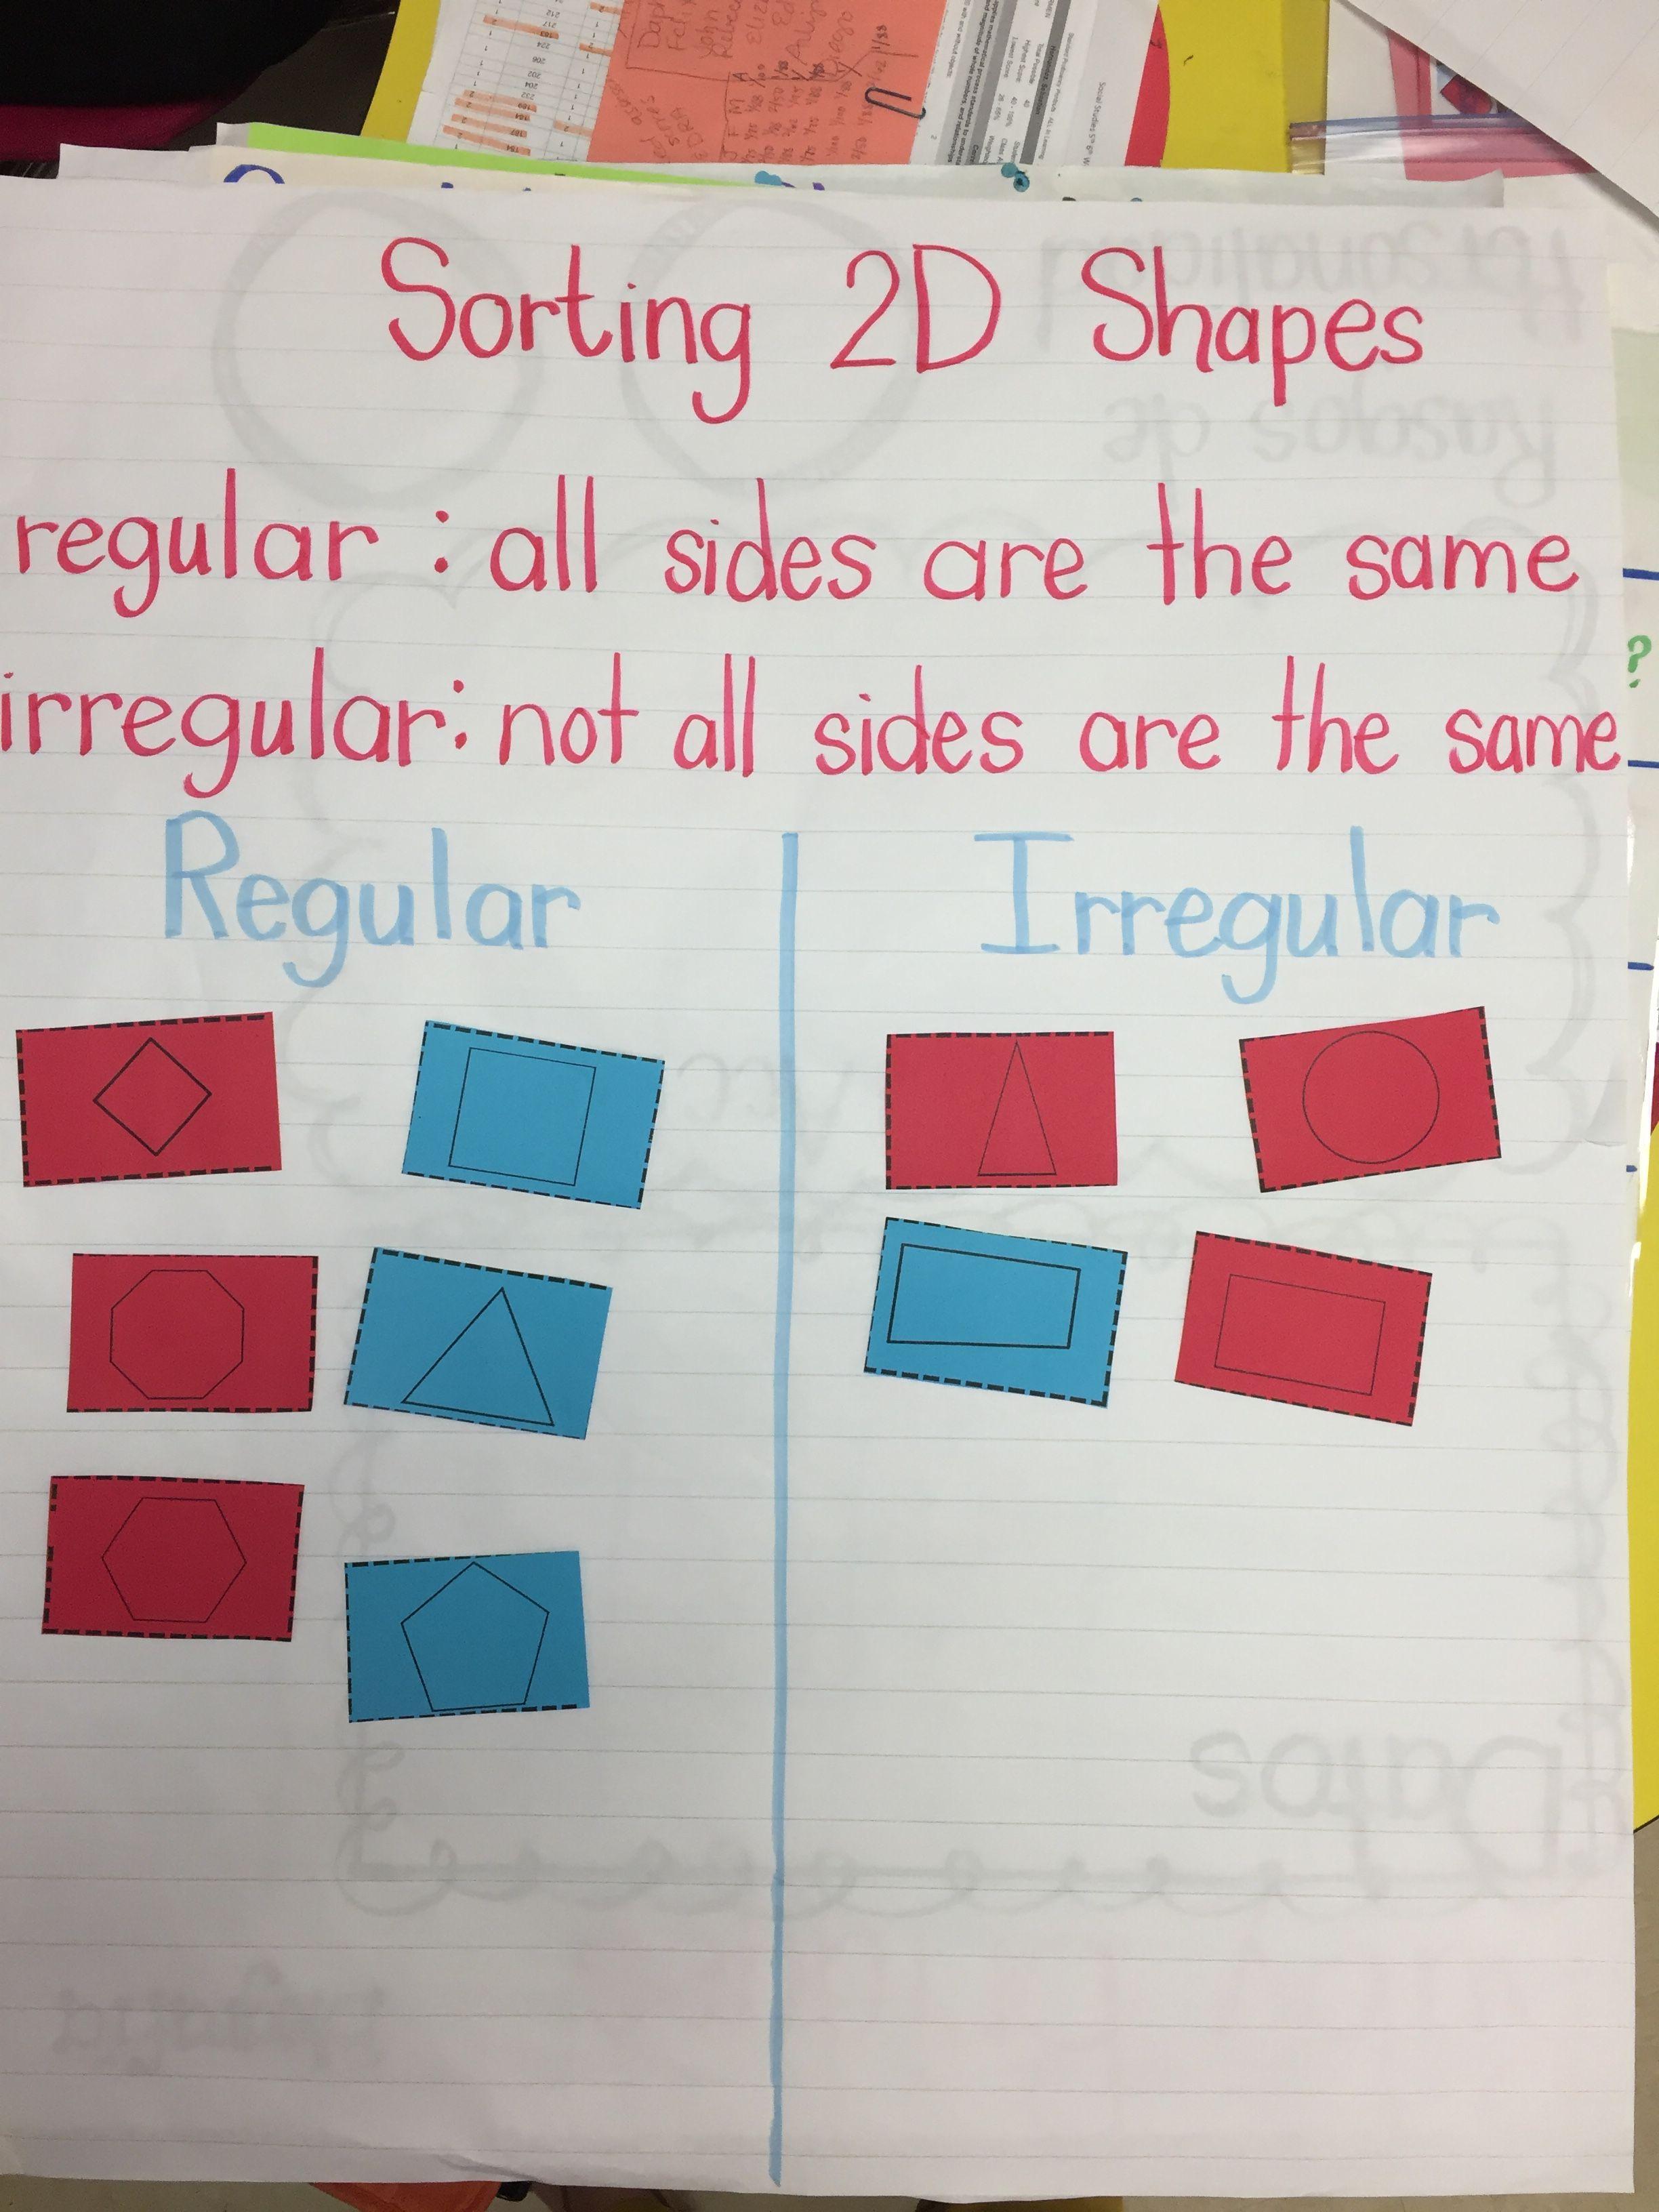 Sorting Regular And Irregular Shapes